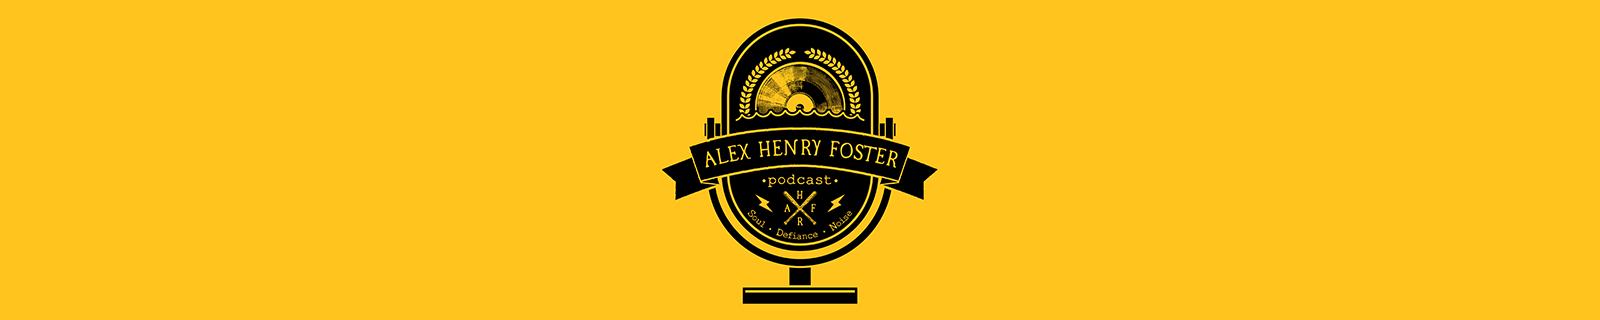 ajh-podcast-banner-website